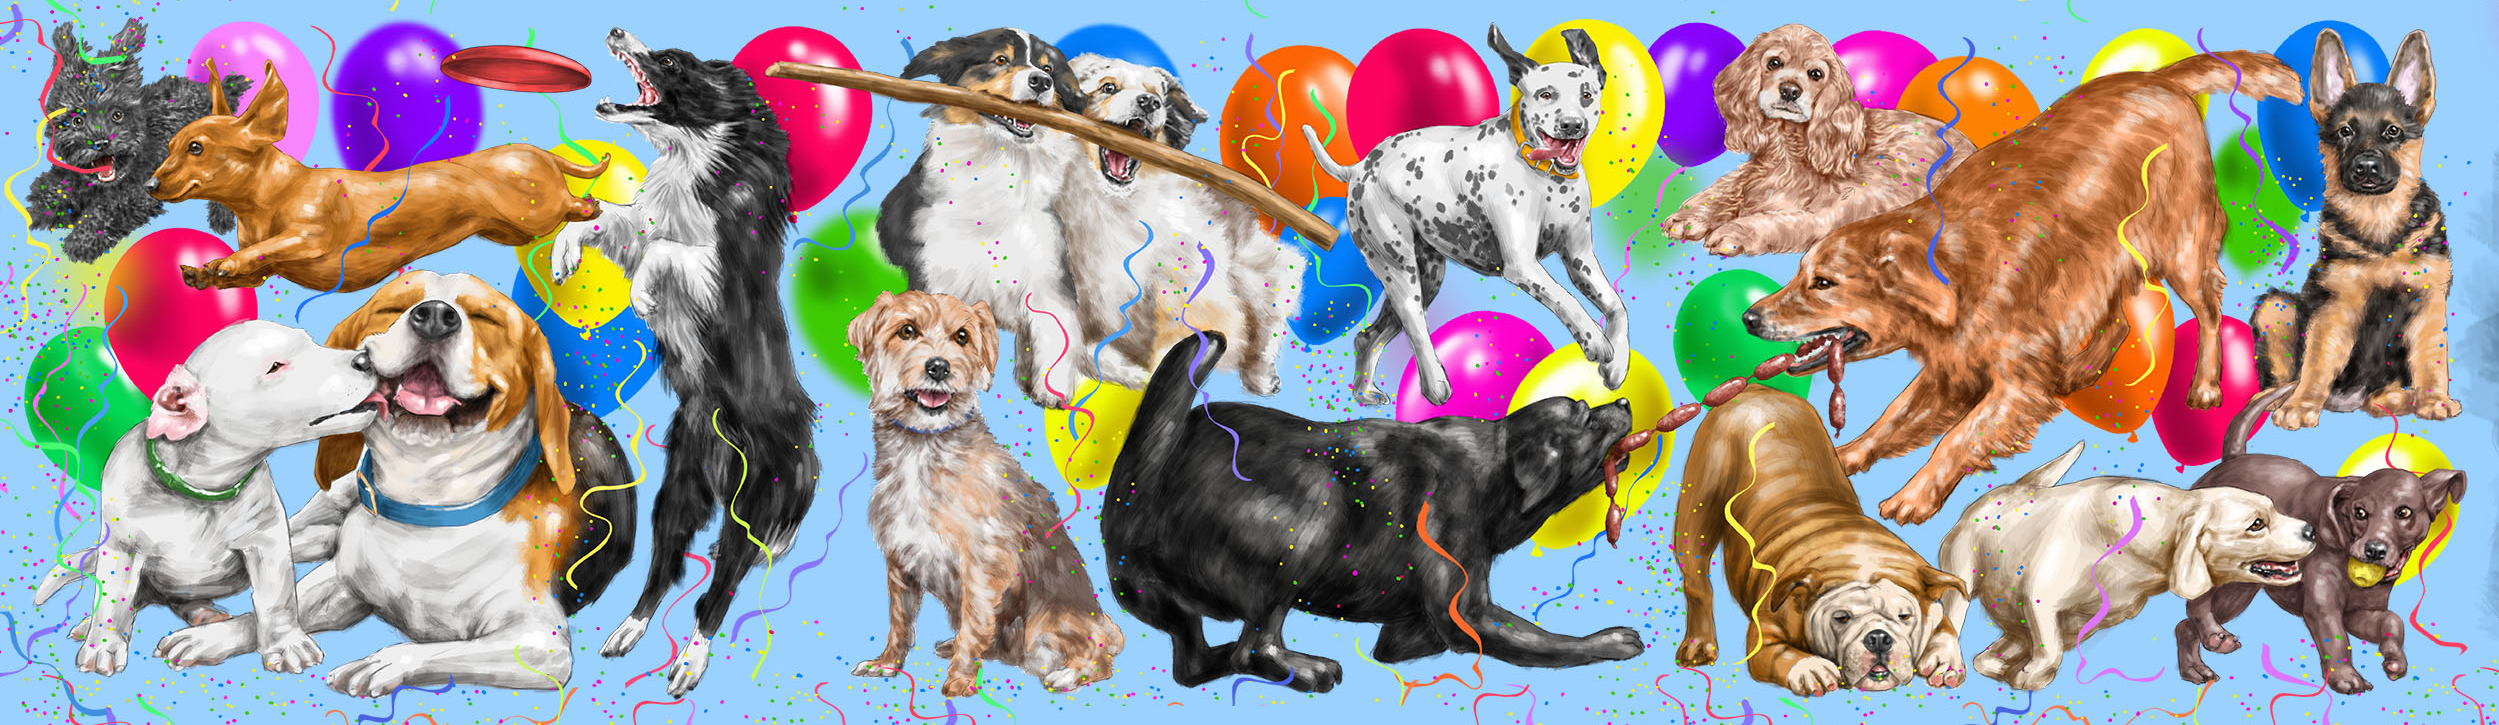 Dog's Birthday Party Poster - Dogstuff Depot (Cordula Maring AD)